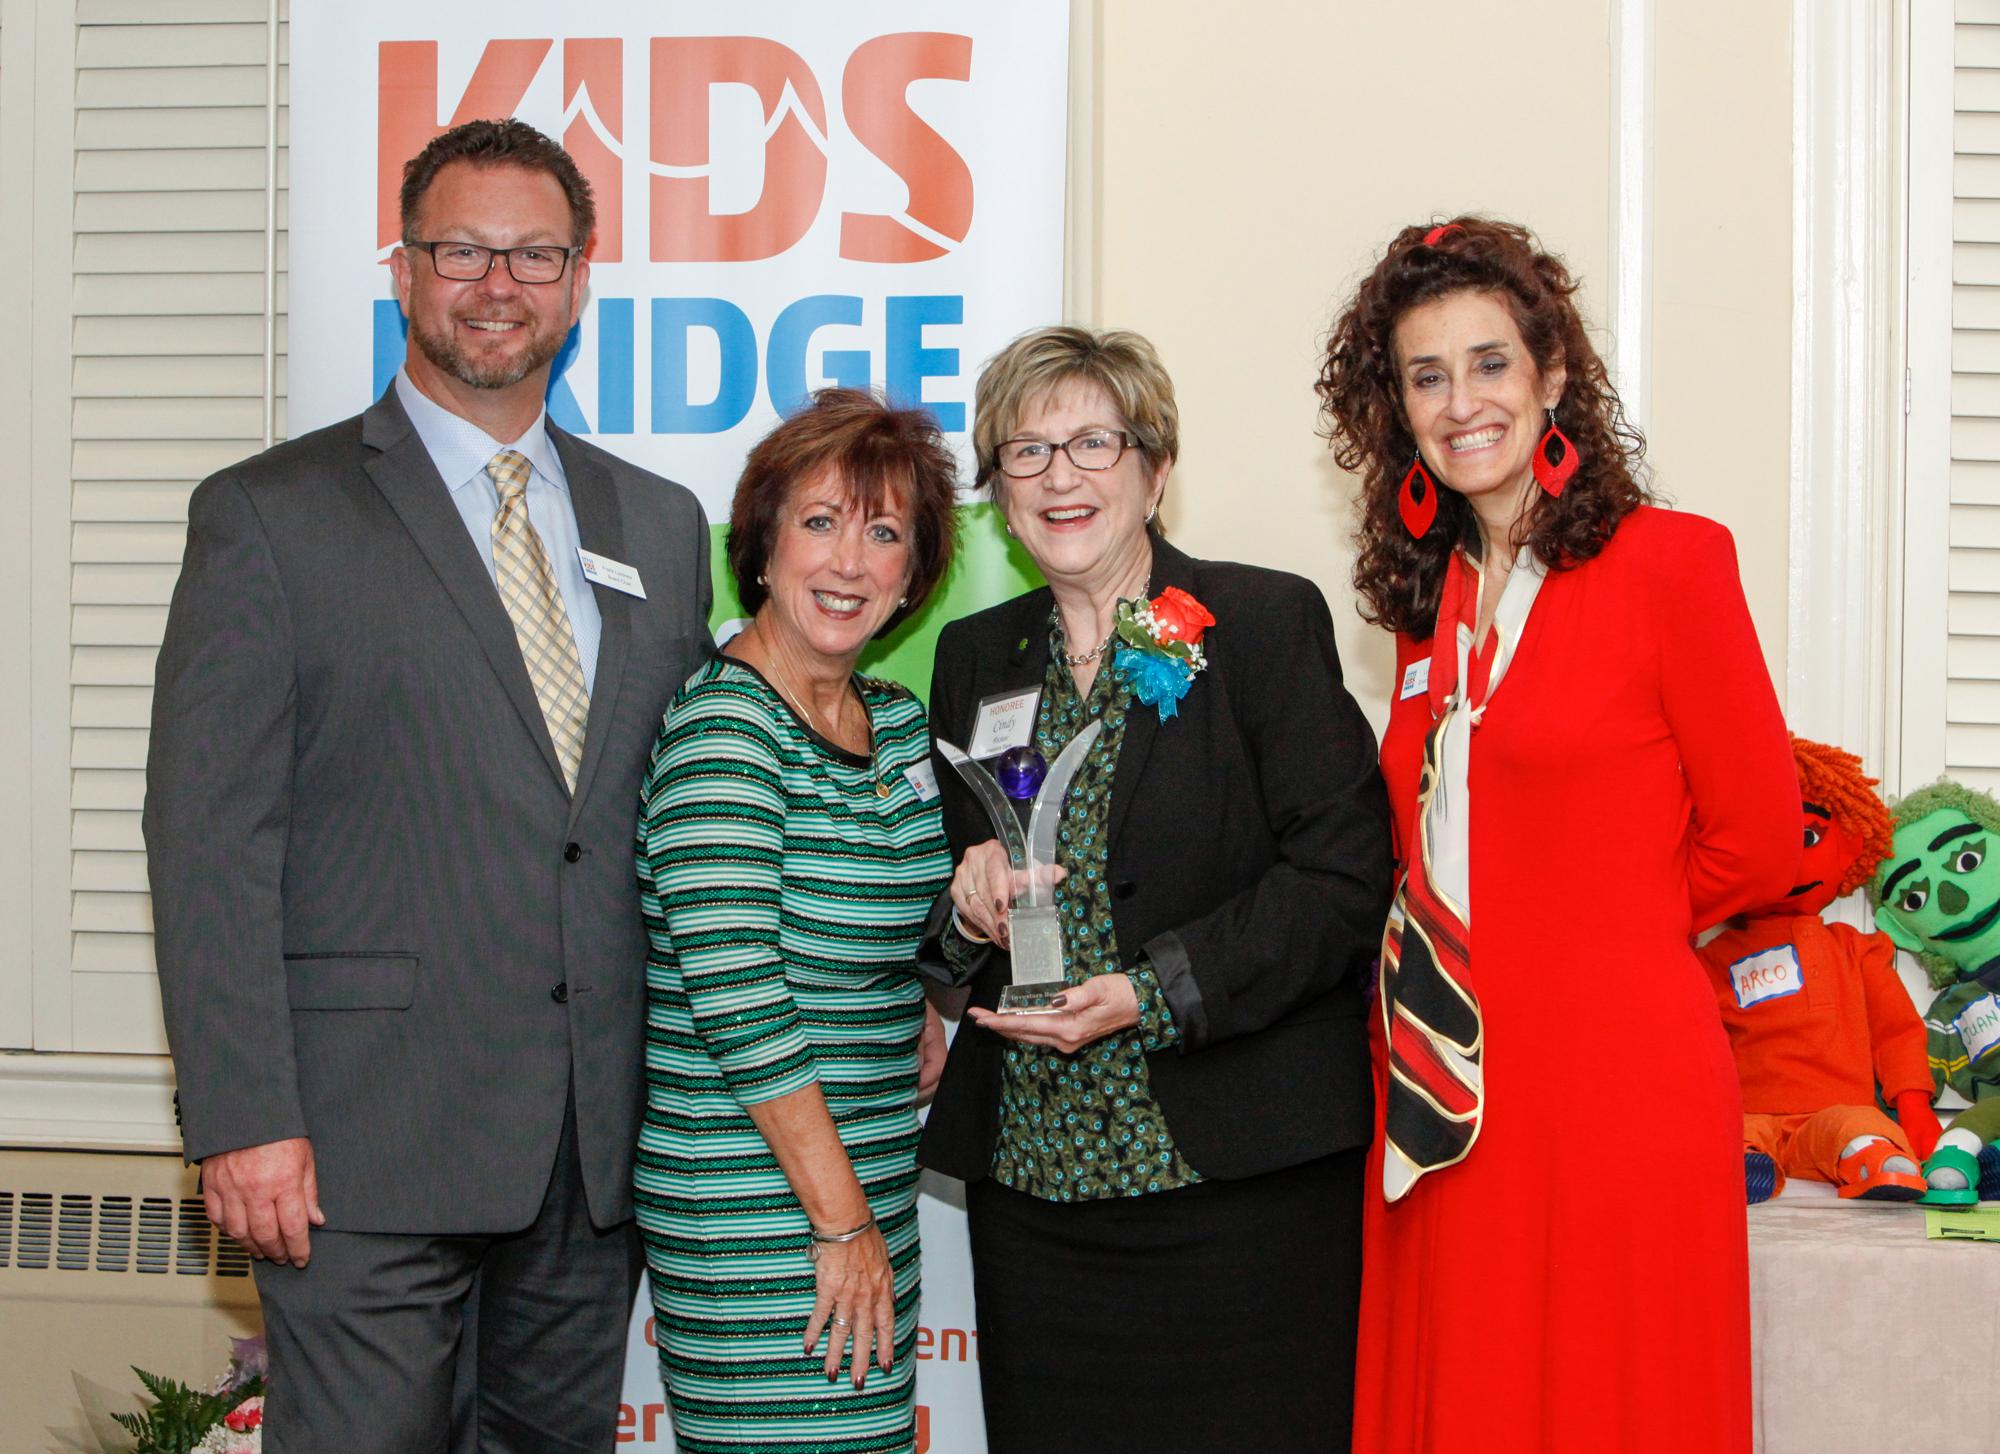 Taken at Kidsbridge's 11th Annual Humanitarian Awards Celebration, held at the Trenton Country Club in Trenton, N.J. Thursday, November 9, 2017. (Photo by Cie Stroud for Kidsbridge)